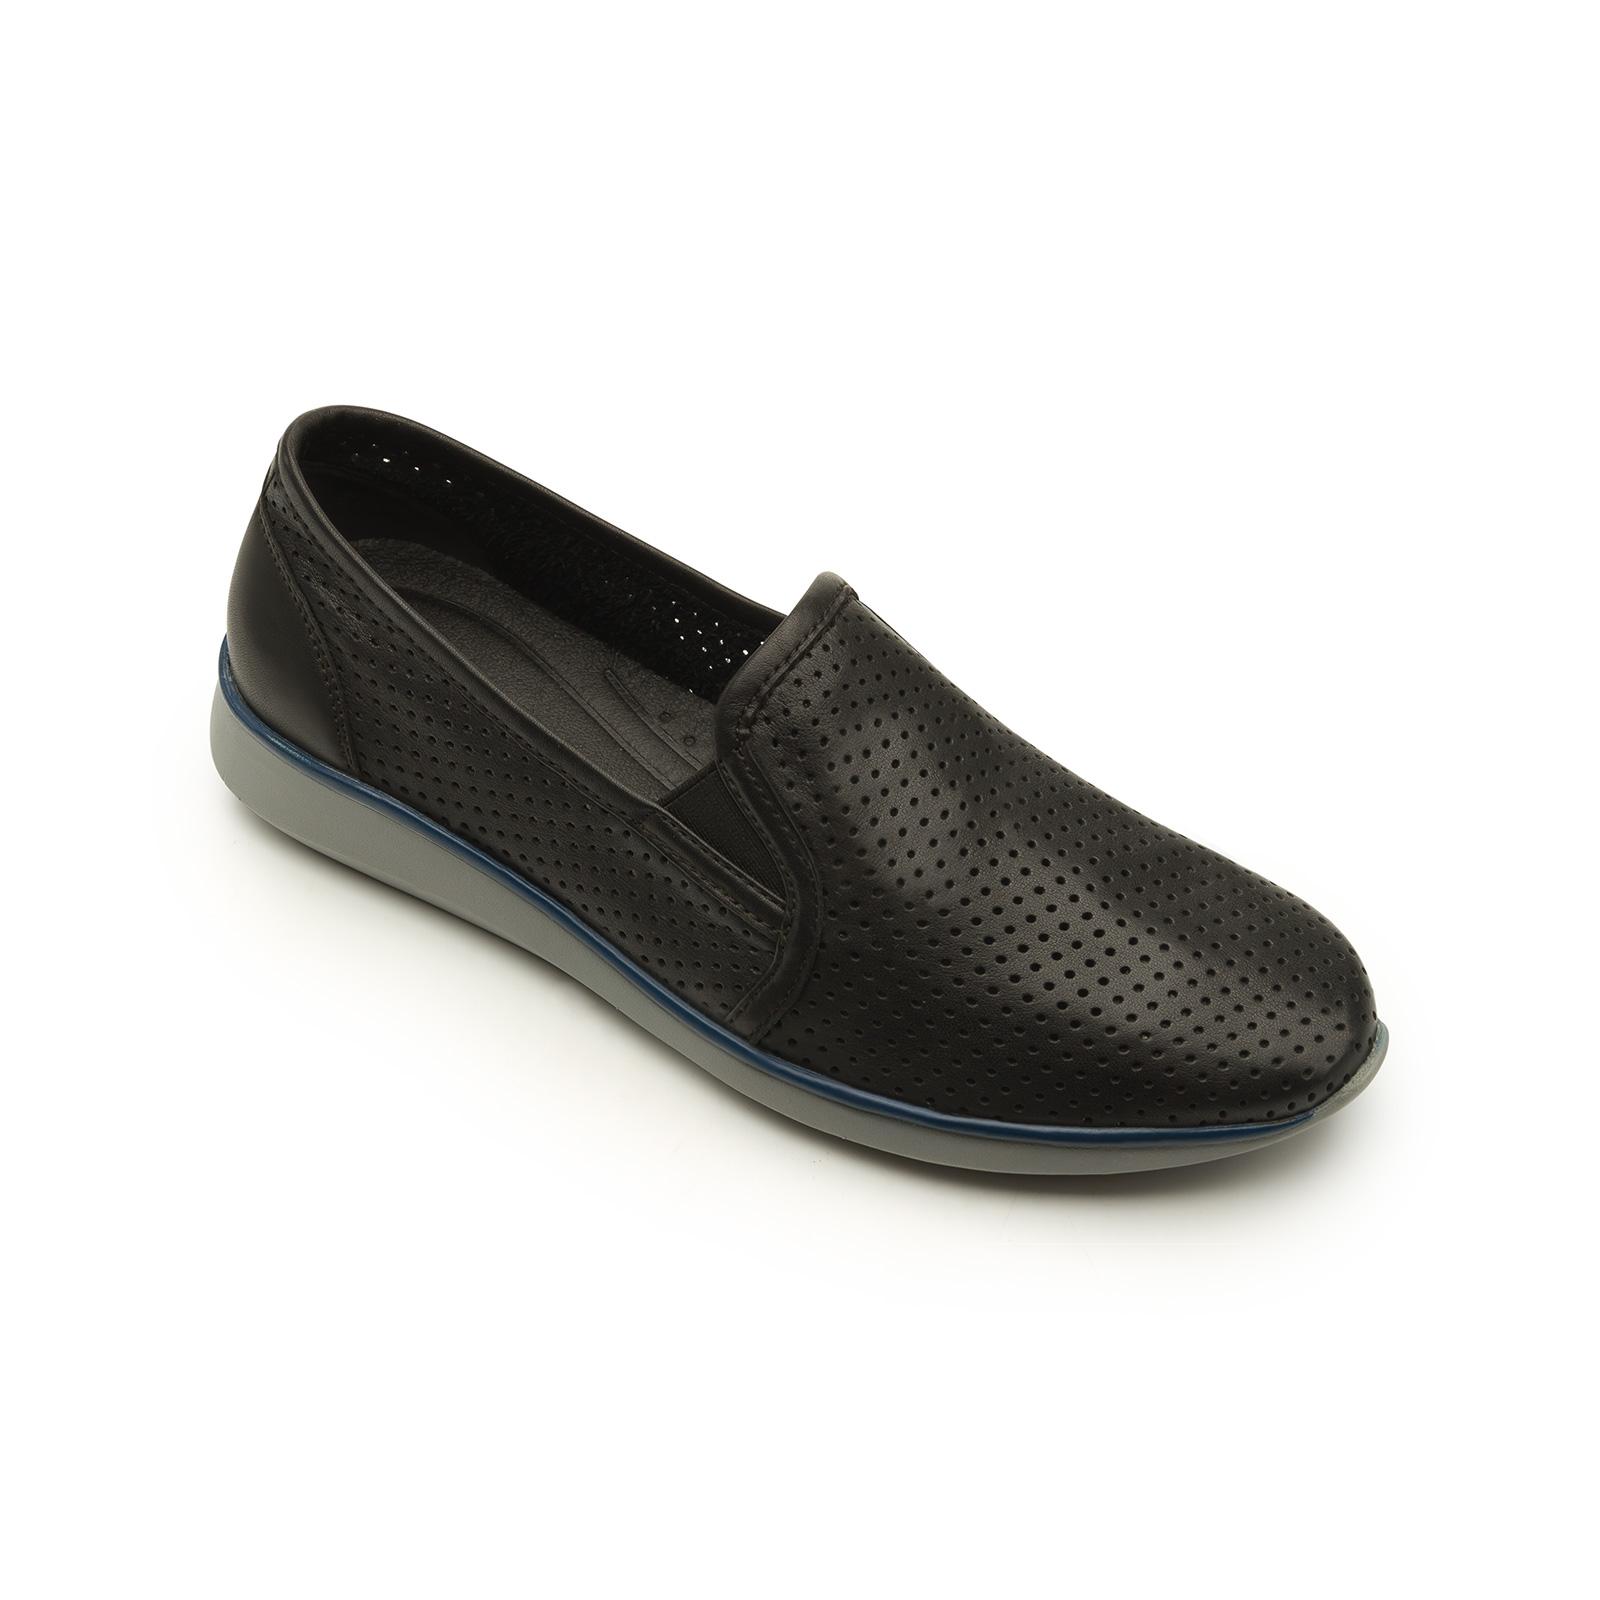 78c4d8d0 Zapatos Confort para Dama al mejor precio - Zapaterías Flexi México